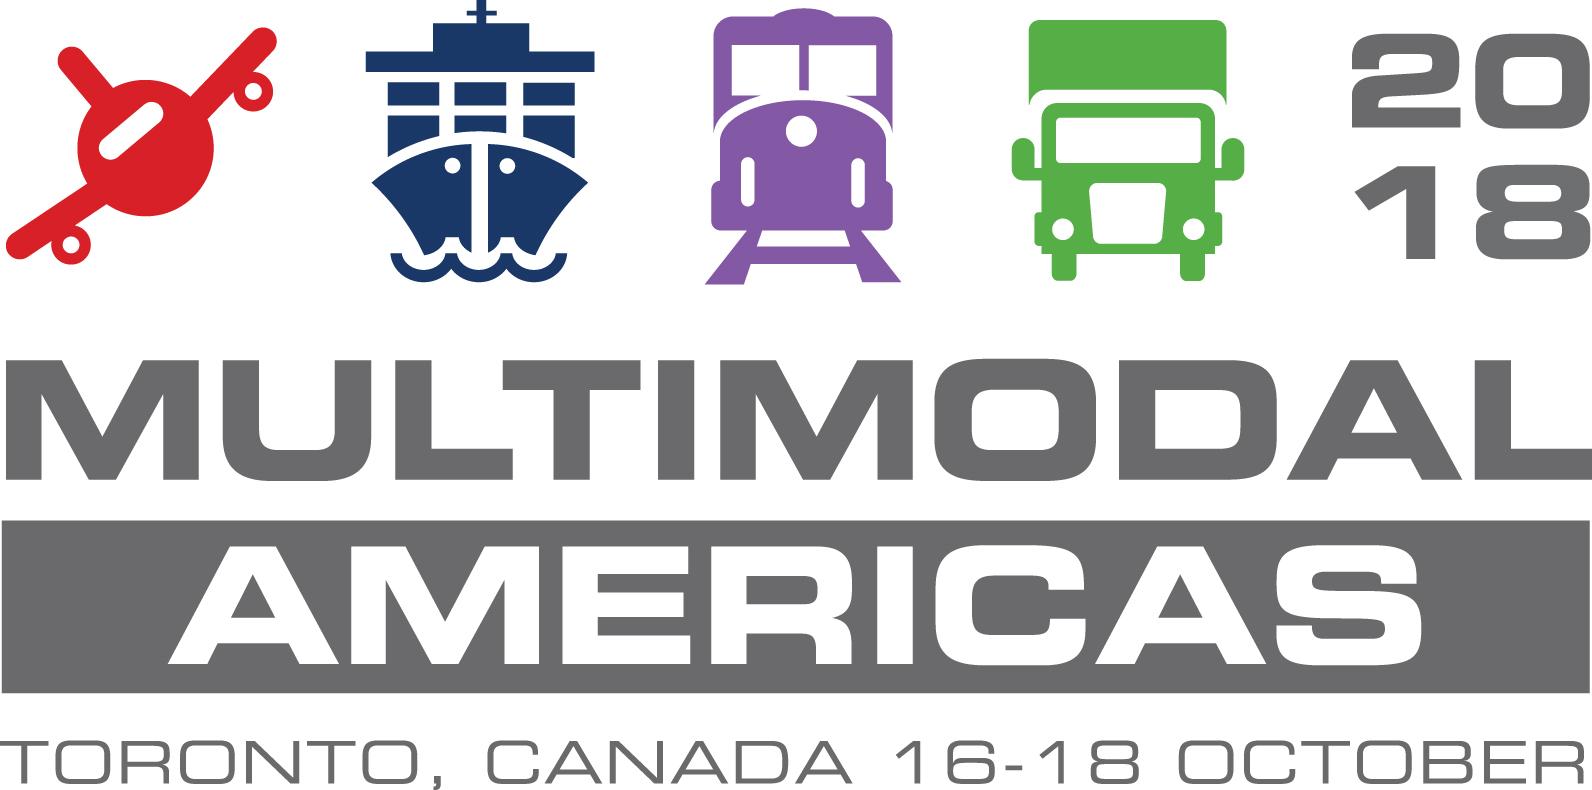 Multimodal_Americas_Logo